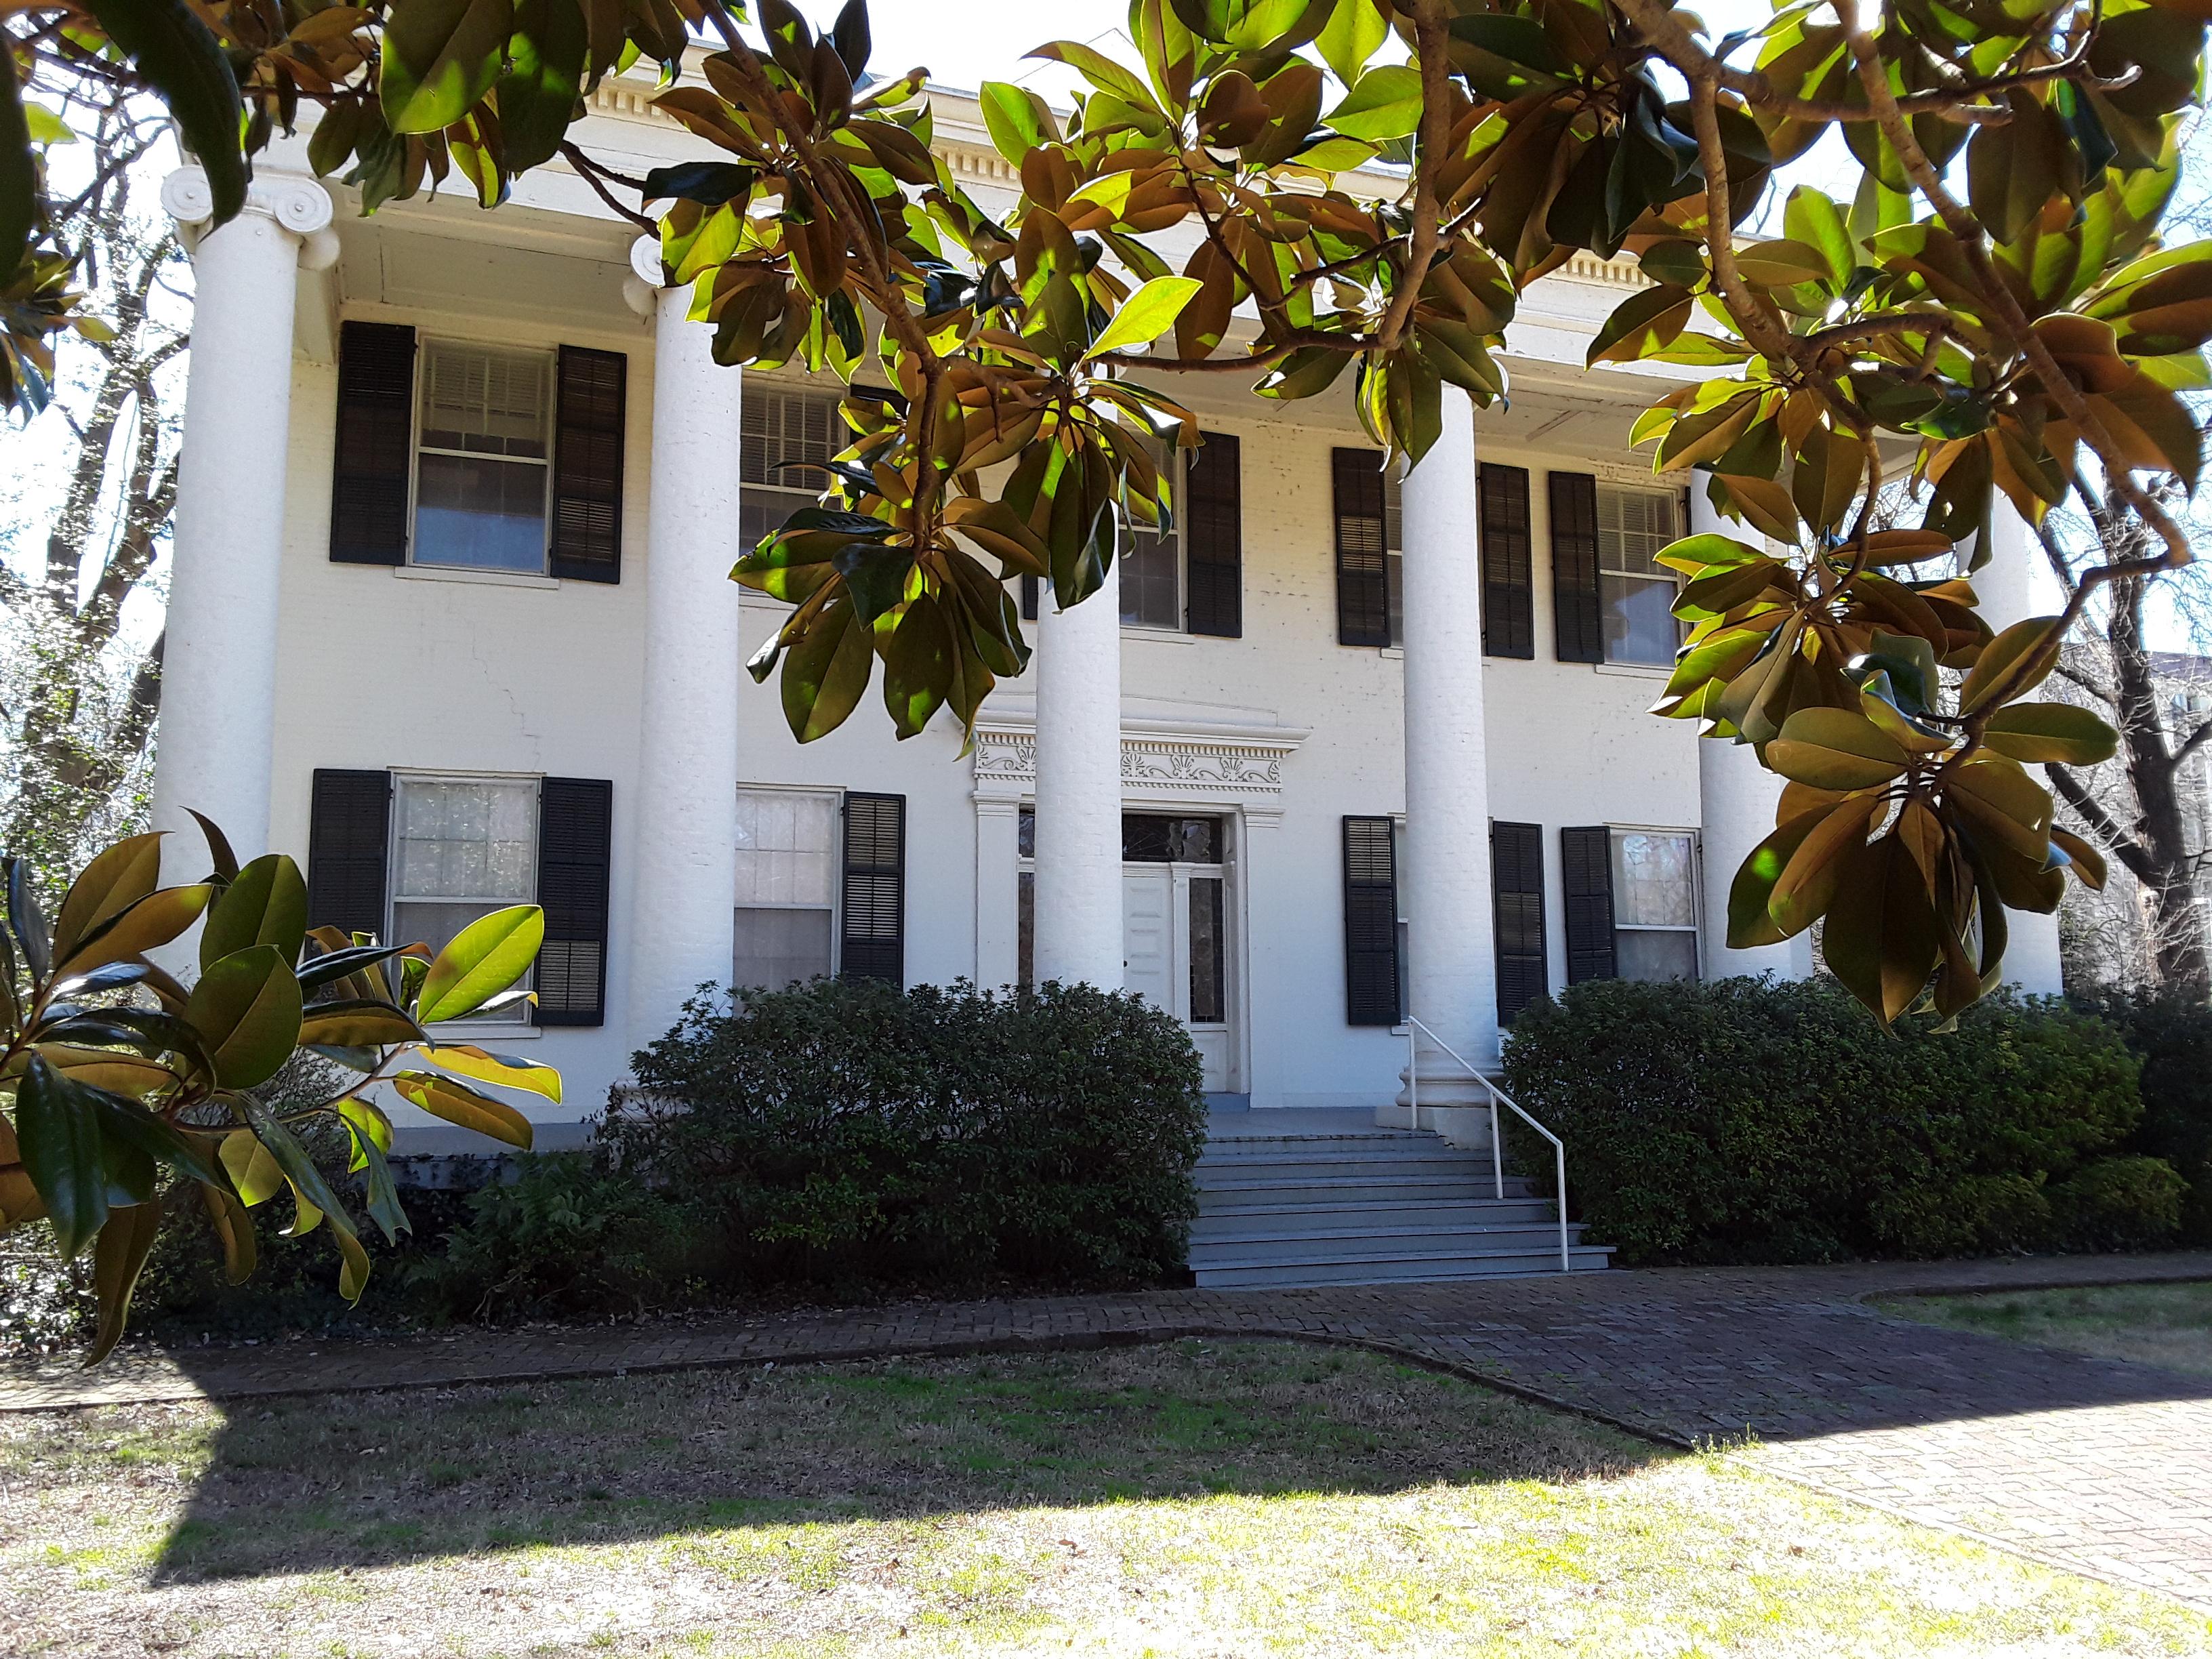 Pike-Terry-Fletcher Mansion